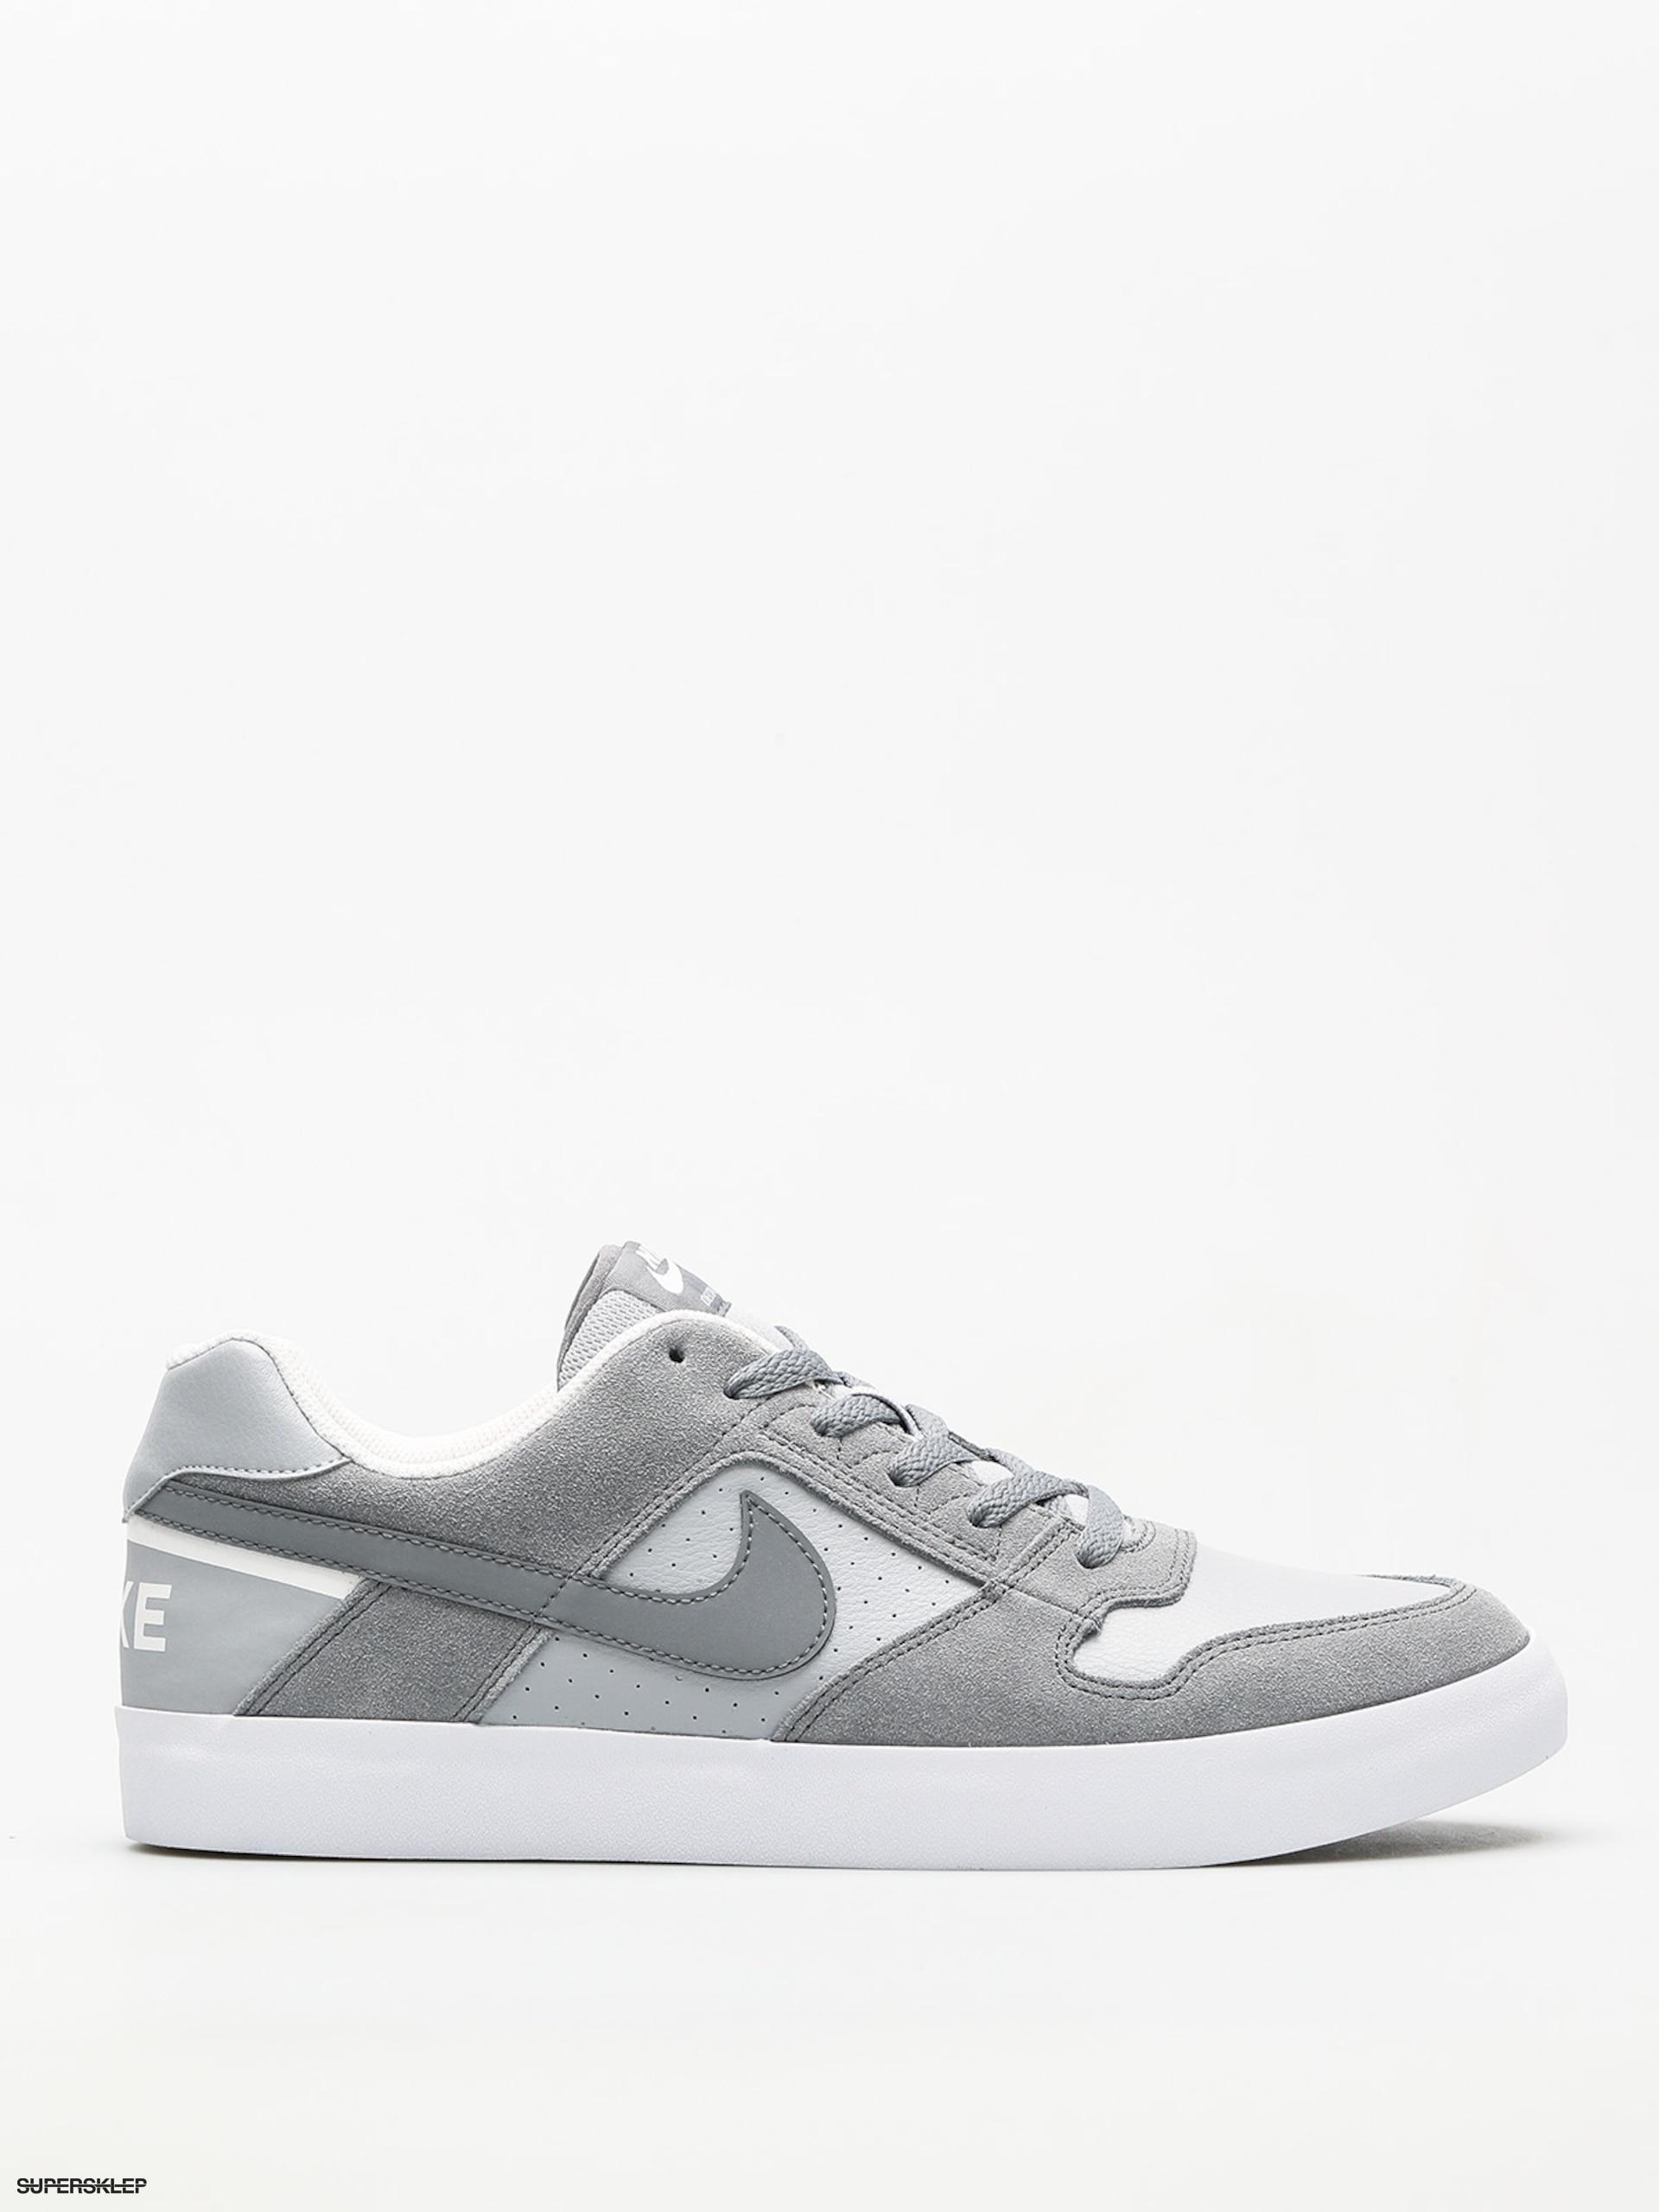 c6807399671d41 Buty Nike SB Sb Delta Force Vulc (cool grey cool grey wolf grey white)